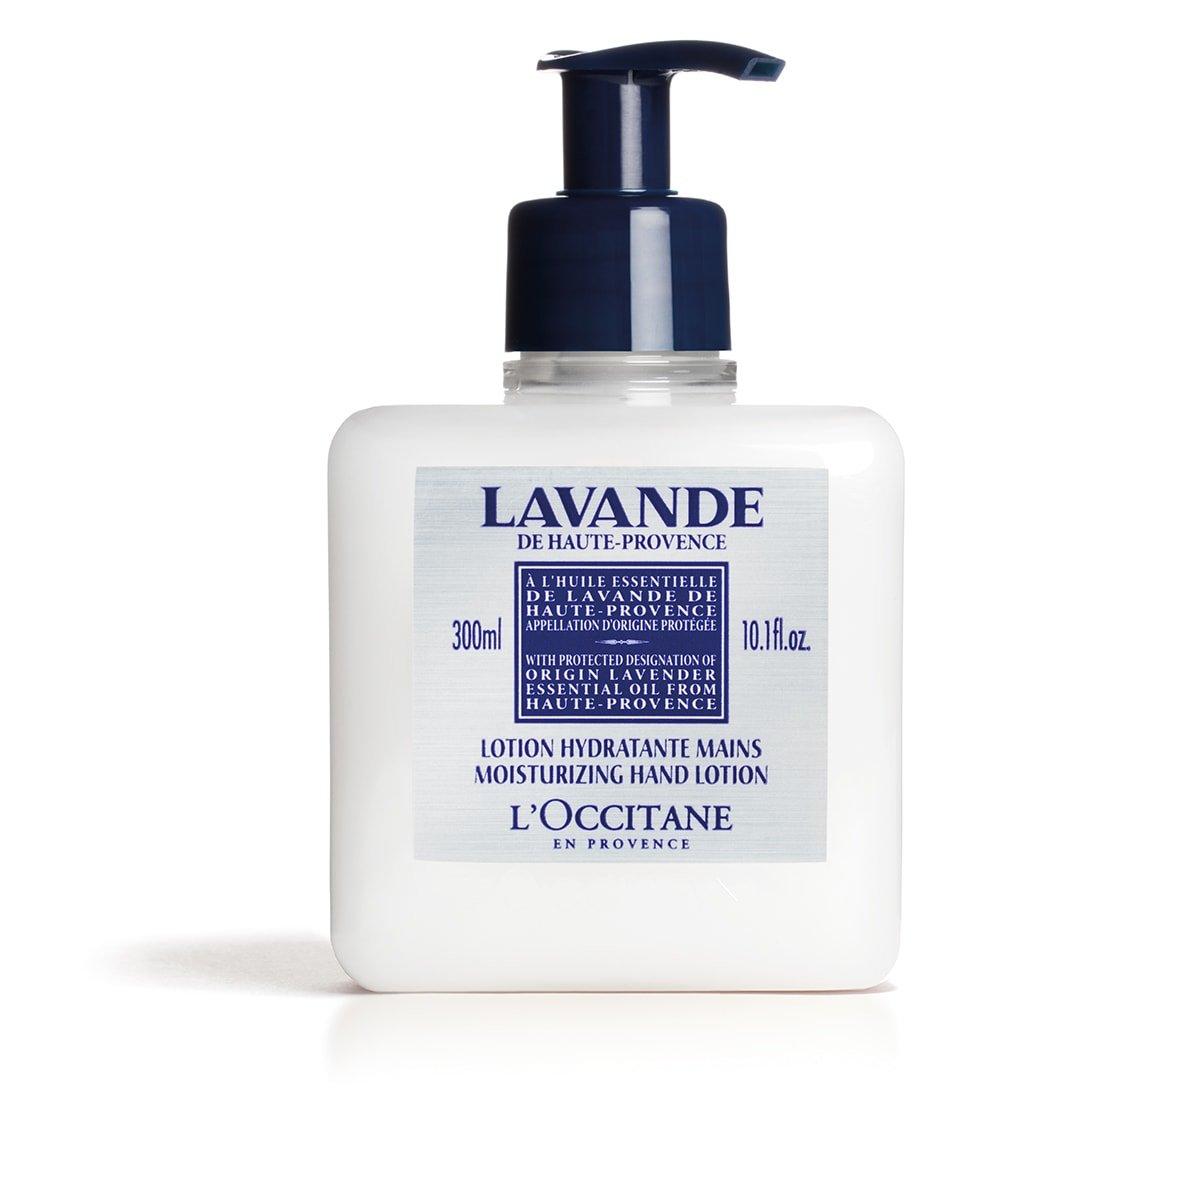 L'Occitane Lavender Moisturizing Hand Lotion, 10.1 fl. oz.